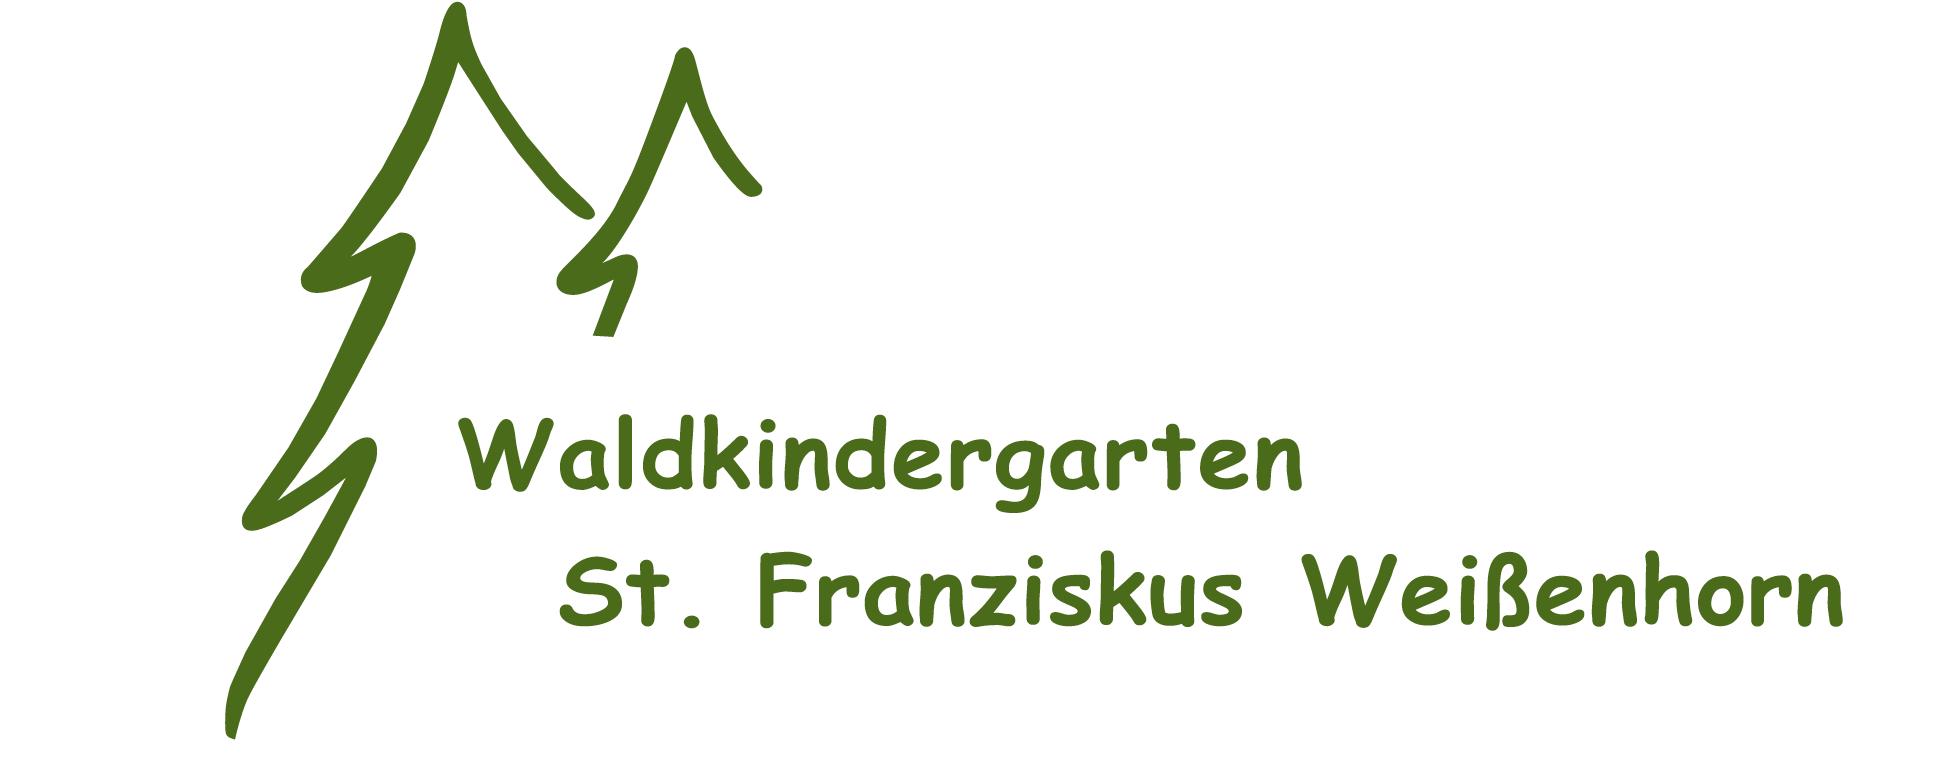 Waldkindergarten Weissenhorn